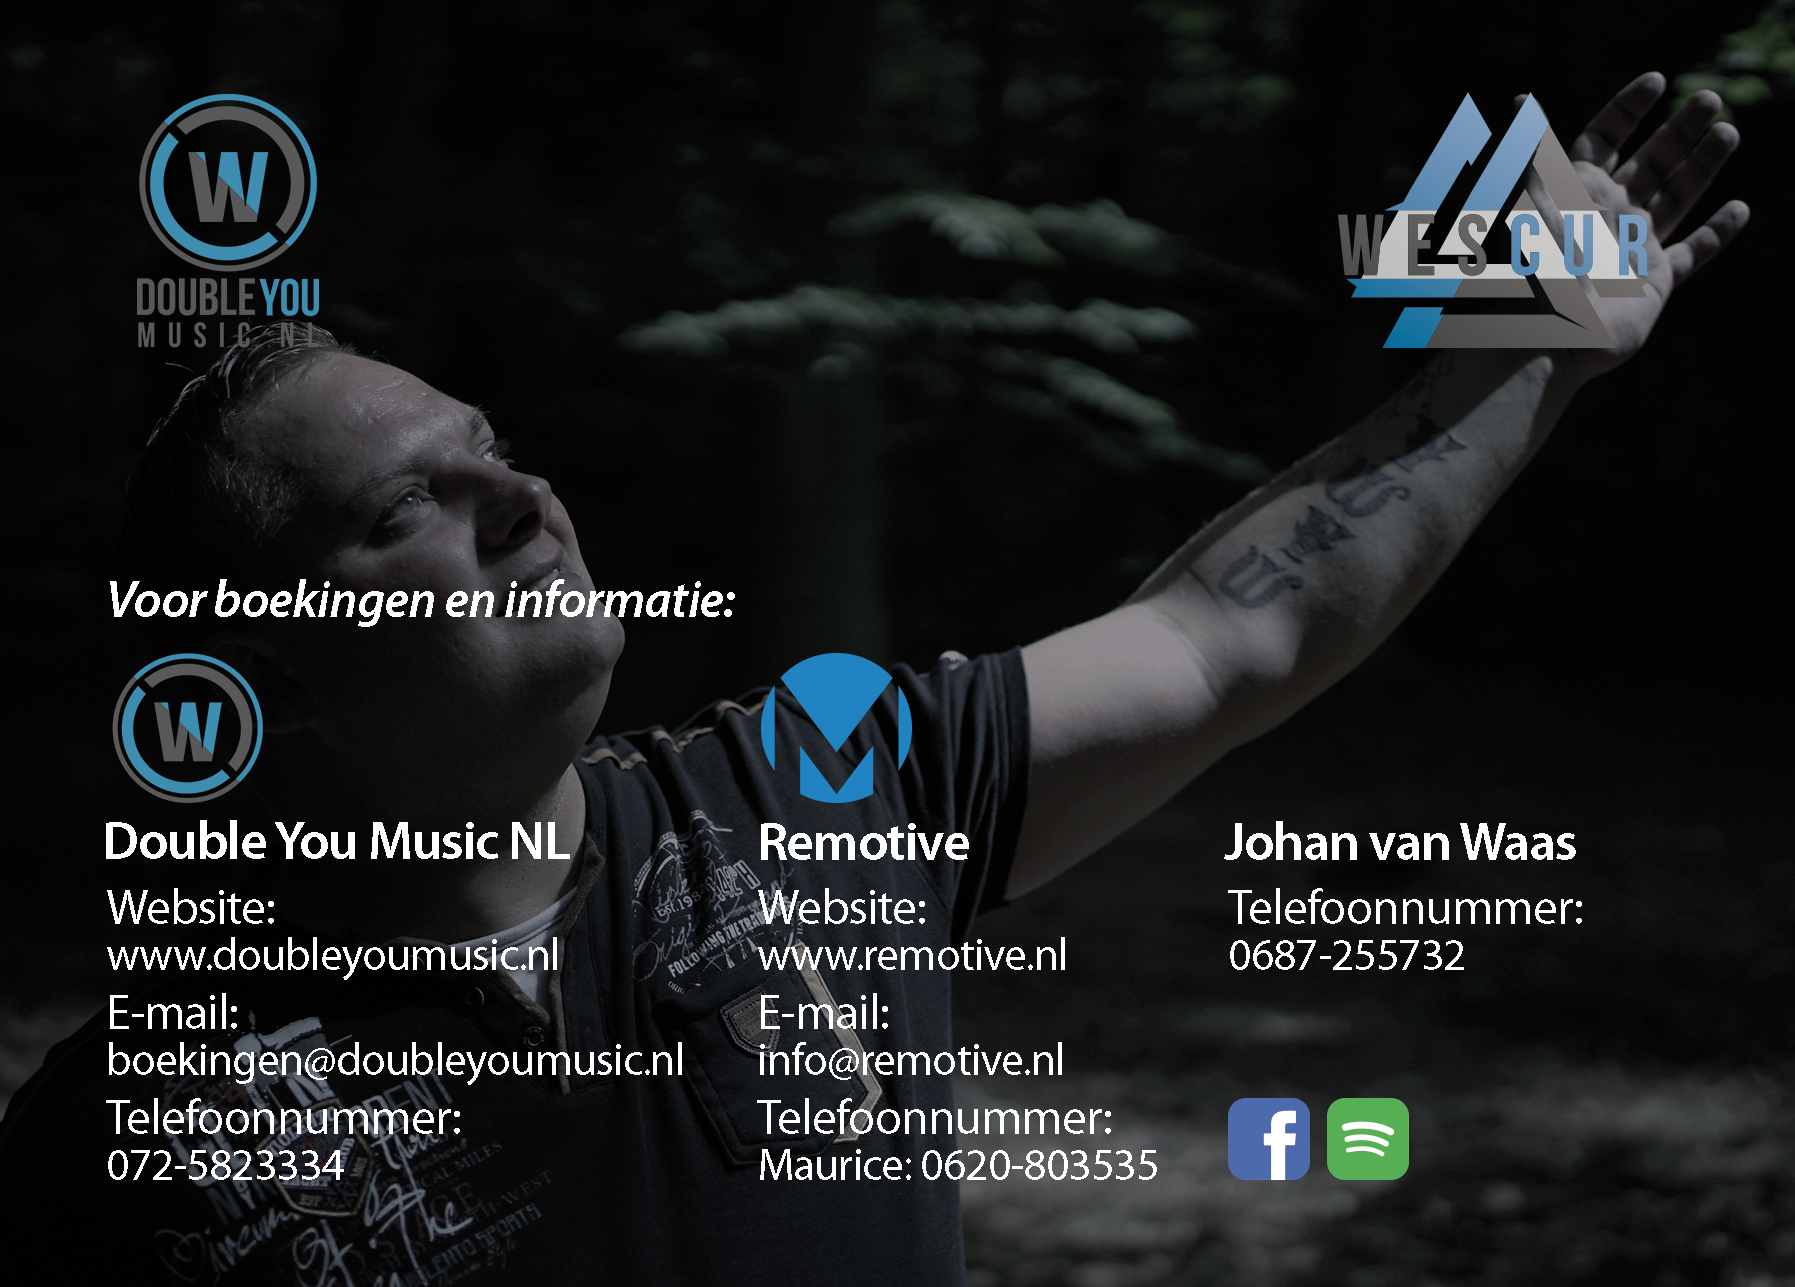 Double-You-Music-NL-Johan-van-Waas-Fotokaart-Achterkant